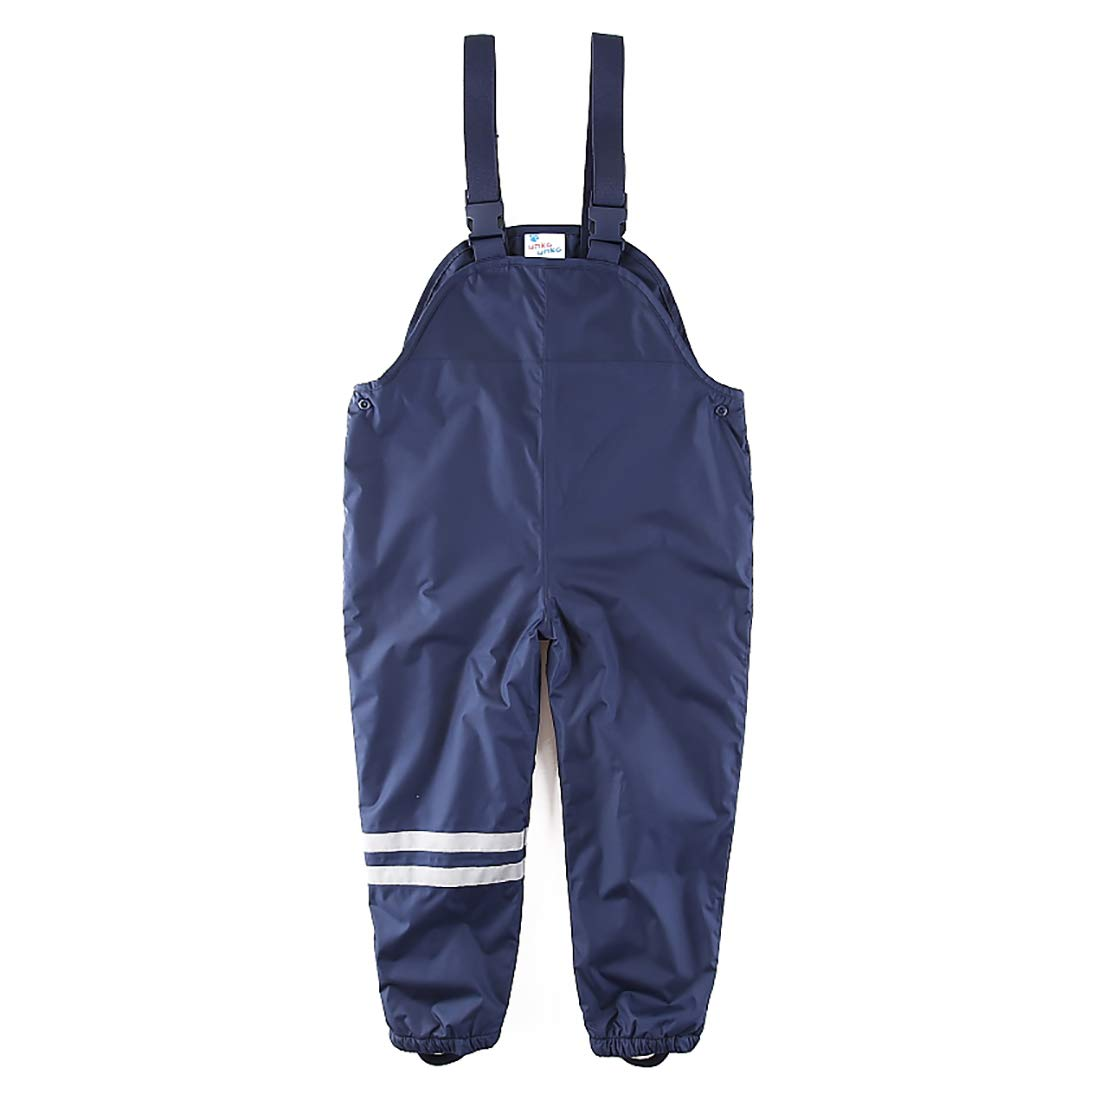 umkaumka Boy Trail Rain Pants Fleece Lined Overalls Bibs Snow Pants 4T Dark Blue